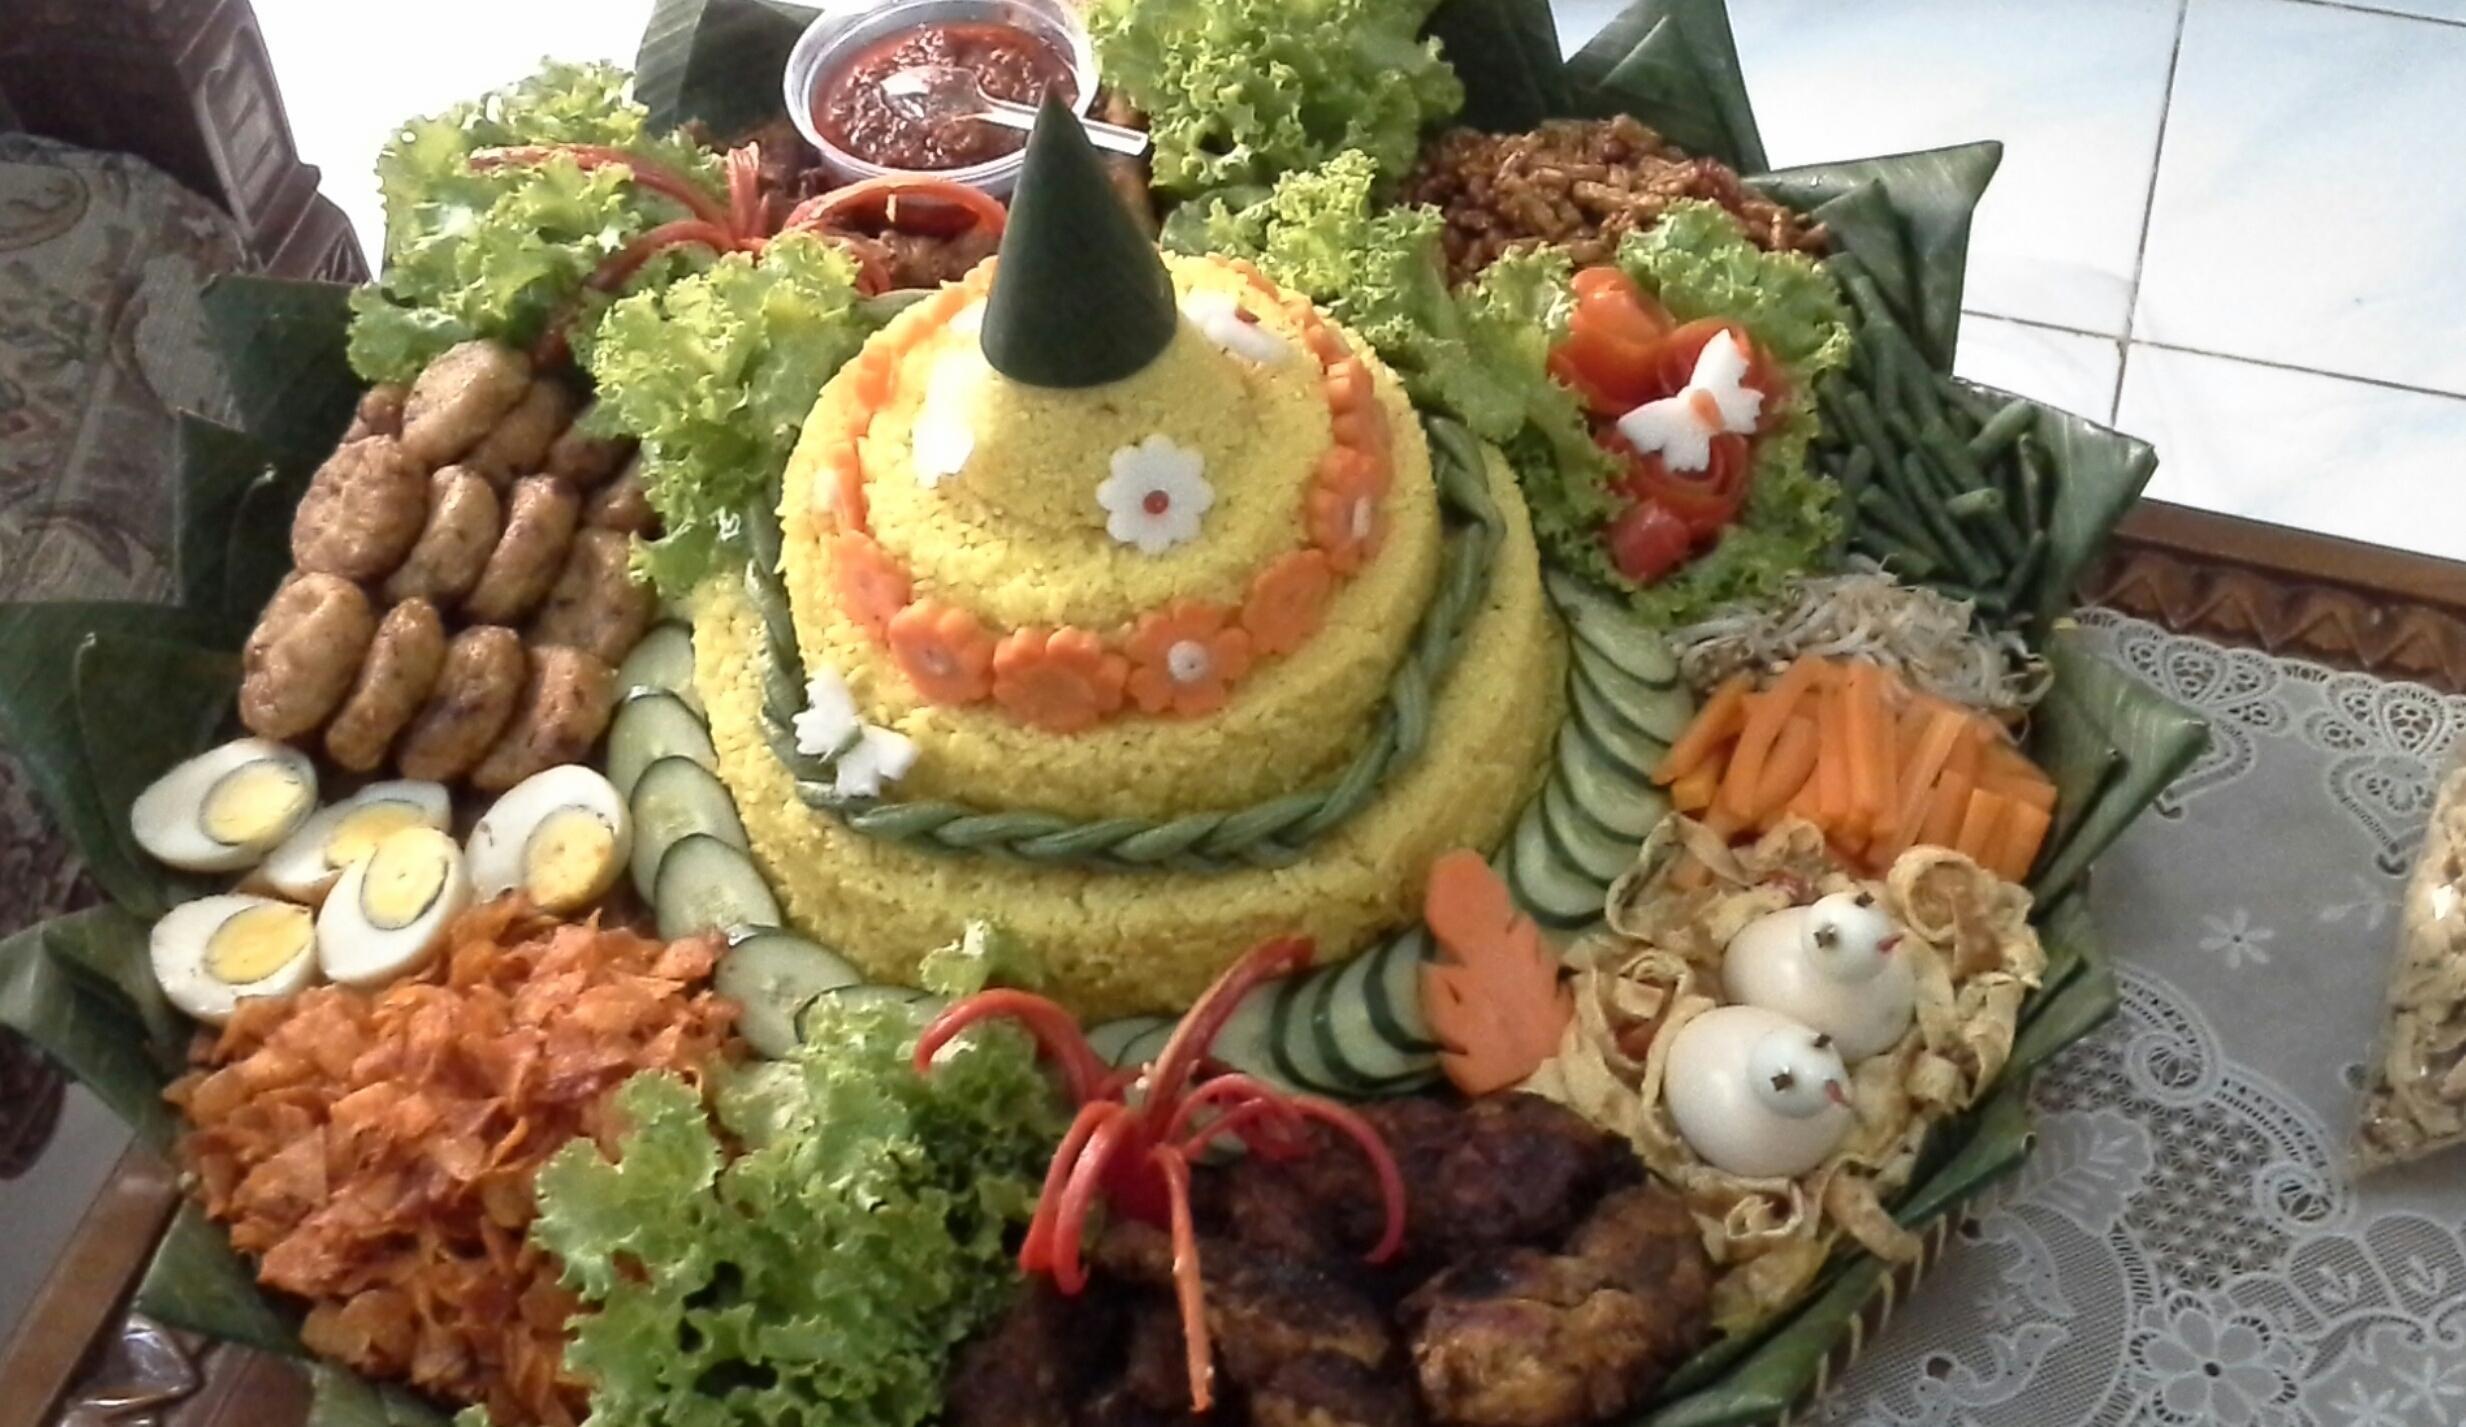 Rosmeina food service